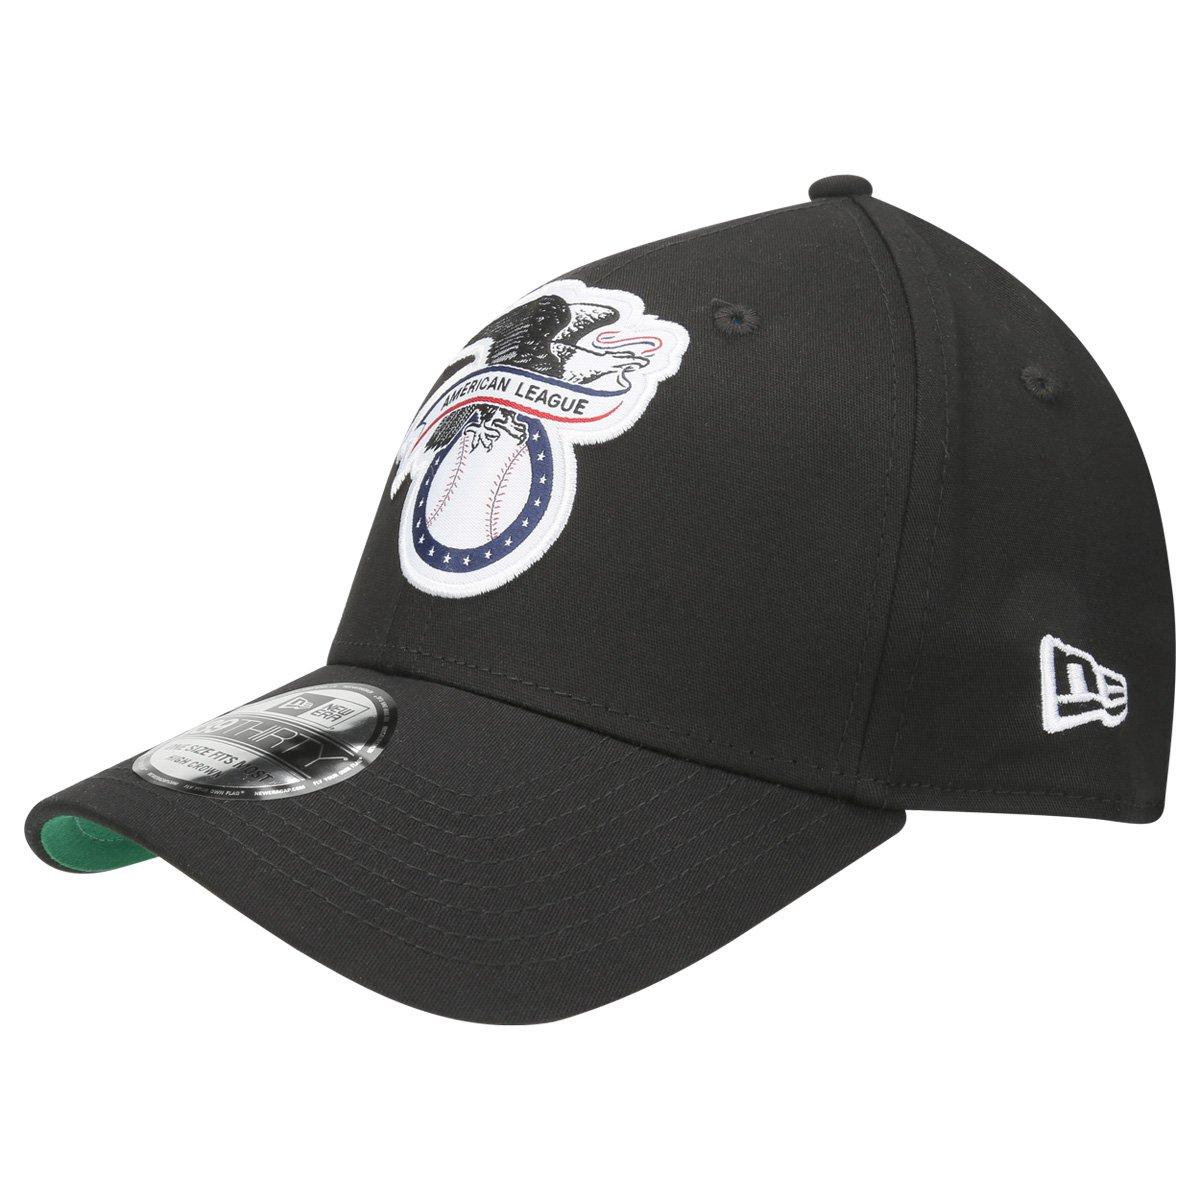 Boné New Era MLB 3930 Hc Basic American League Otc - Compre Agora ... 5b9c58d622b